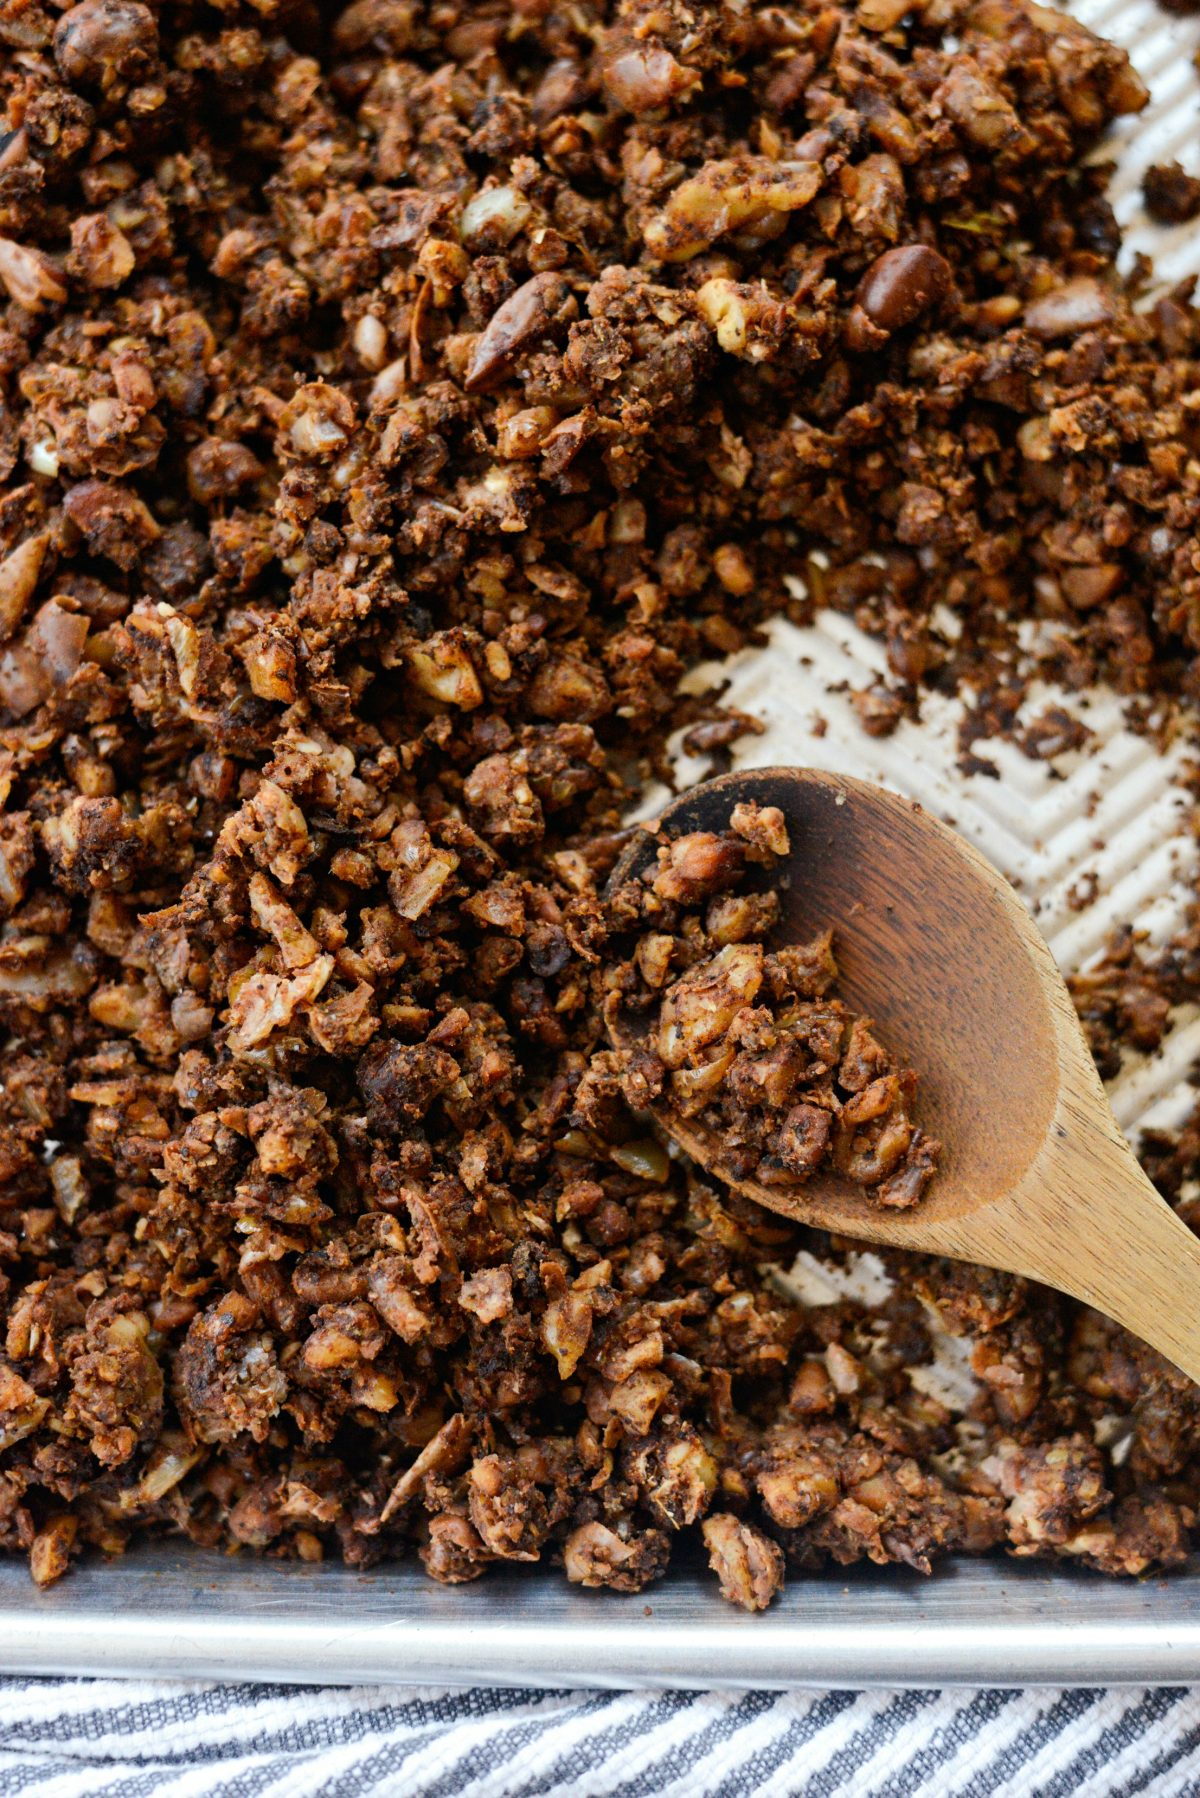 Vegan Chorizo Crumbles l SimplyScratch.com #fava #beans #walnuts #mushrooms #chorizo #vegan #vegetarian